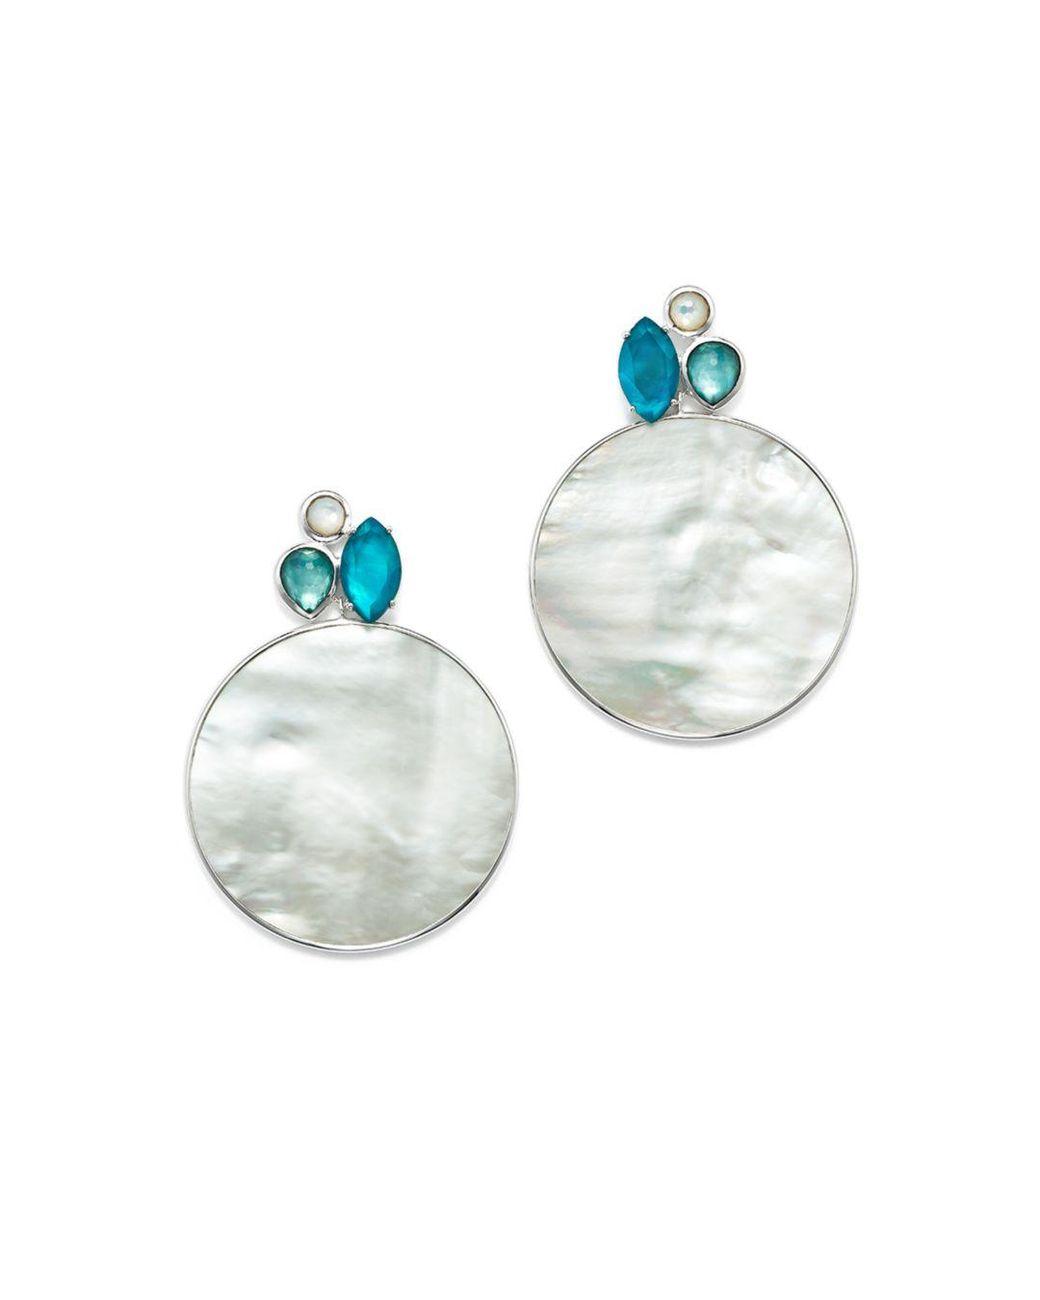 f952b7cbf Ippolita Sterling Silver Wonderland Mother - Of - Pearl & Clear Quartz  Doublet Cluster & Round Drop Earrings In Bermuda in Metallic - Lyst